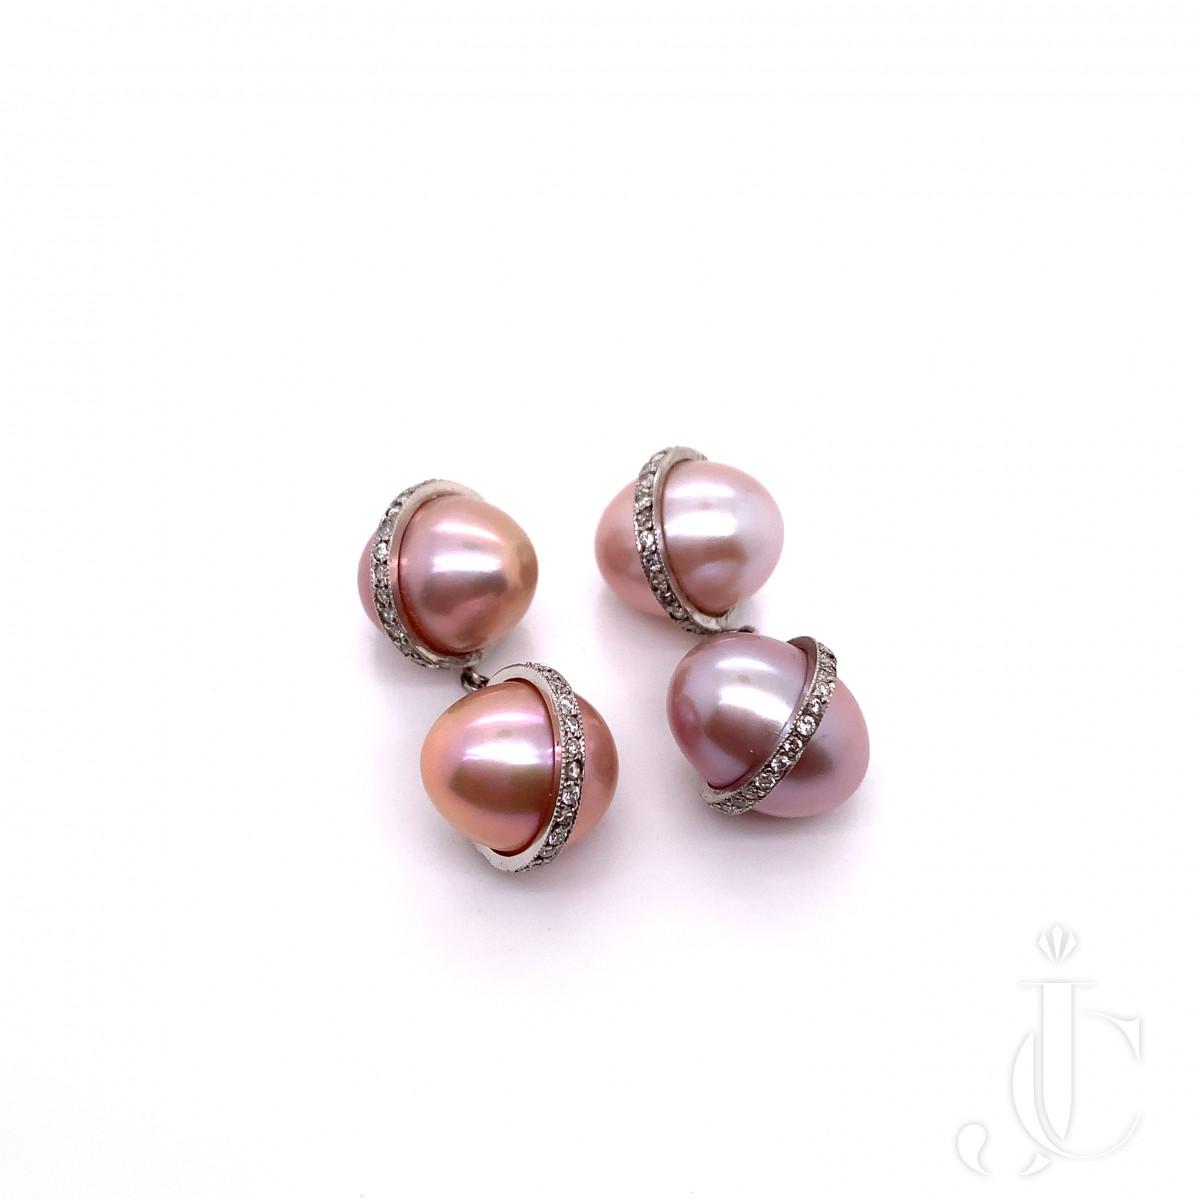 A pair of platinum pearl cufflink